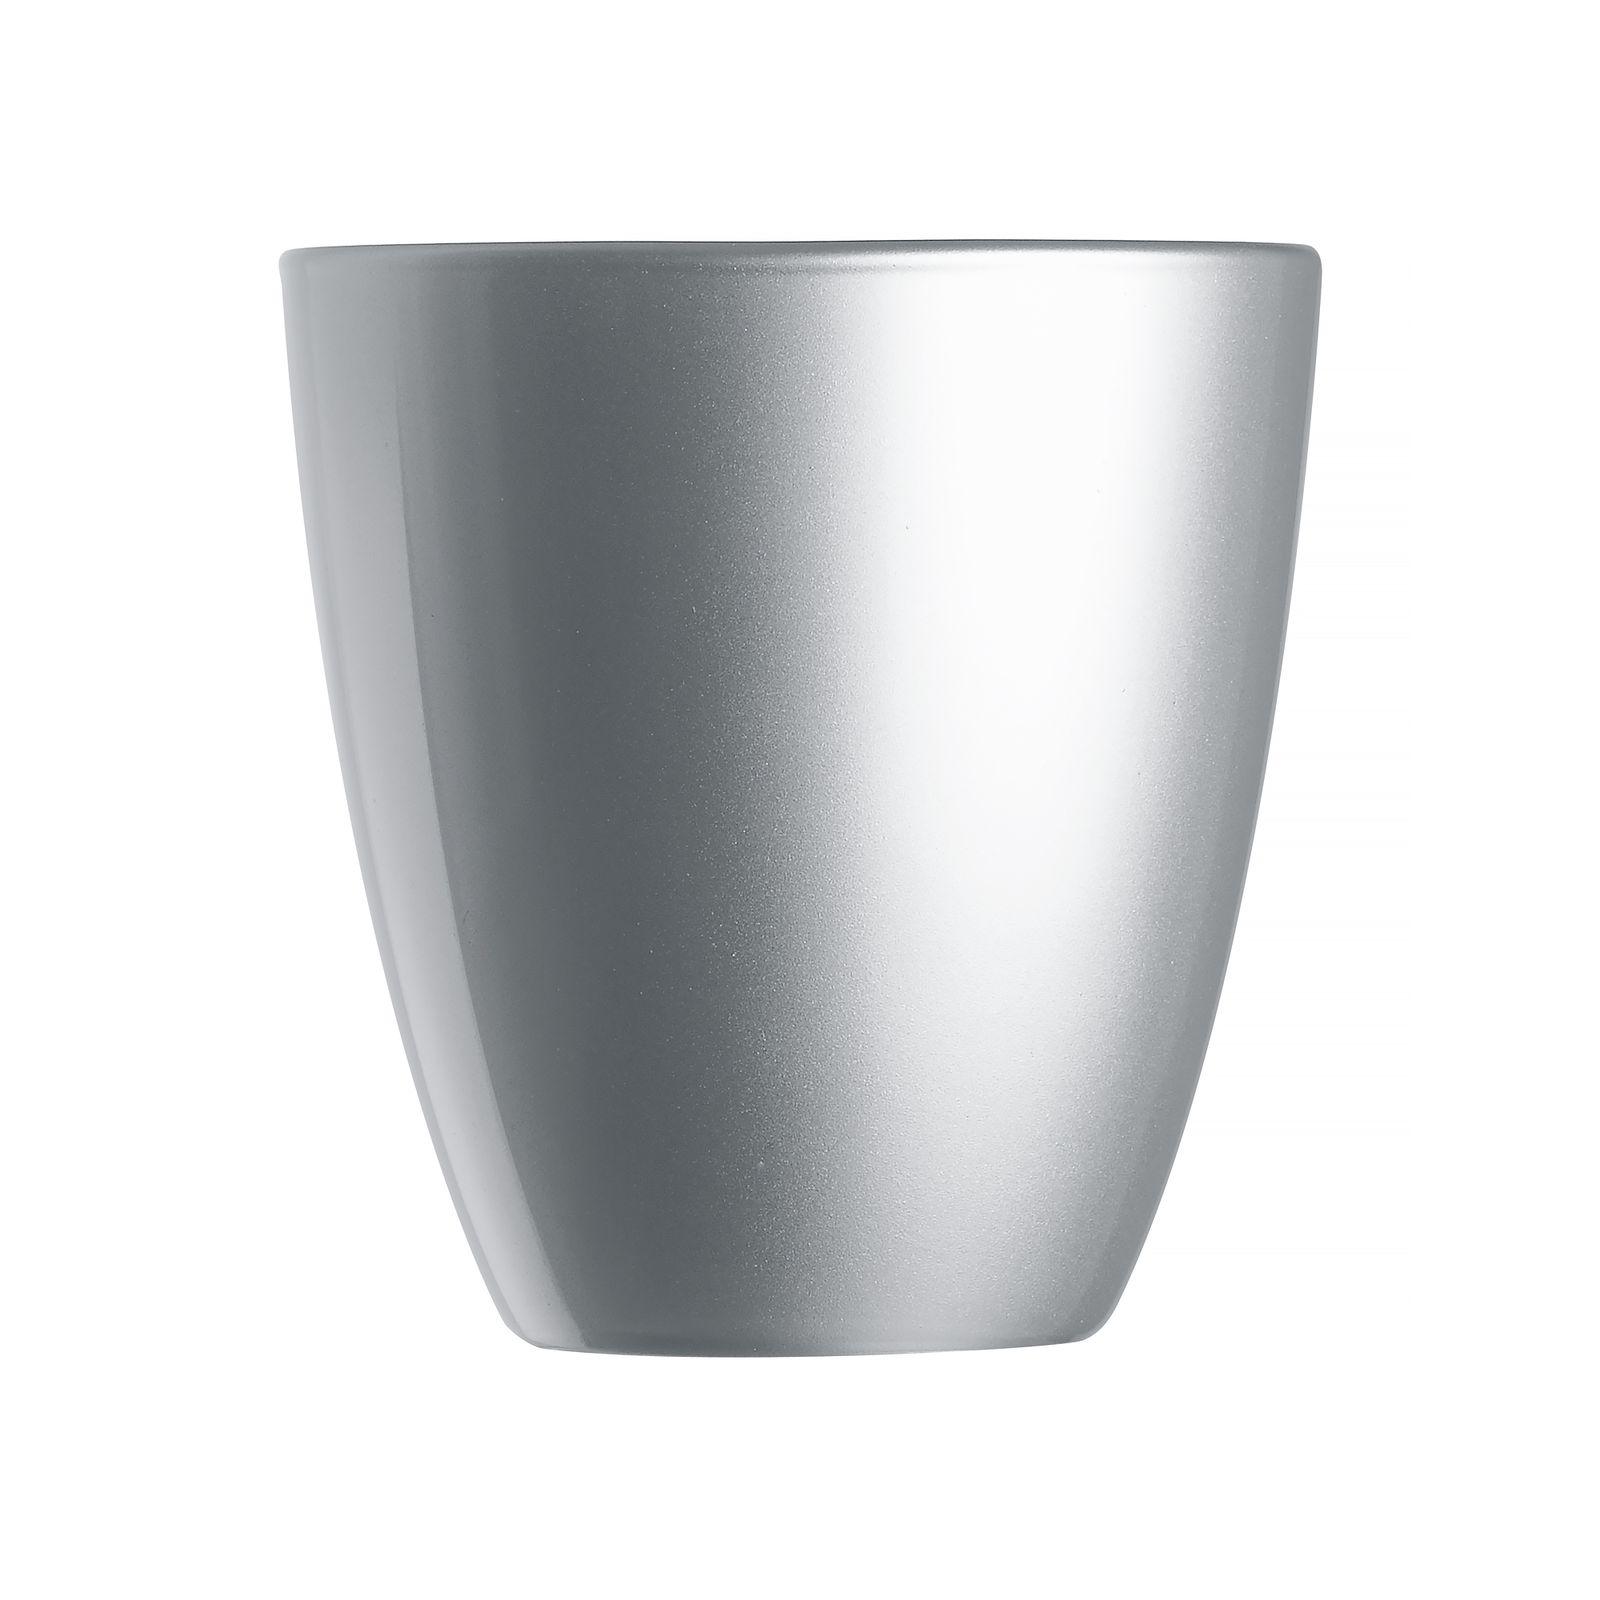 Portacandele Abacco Silver 8,5 cm LUMINARC